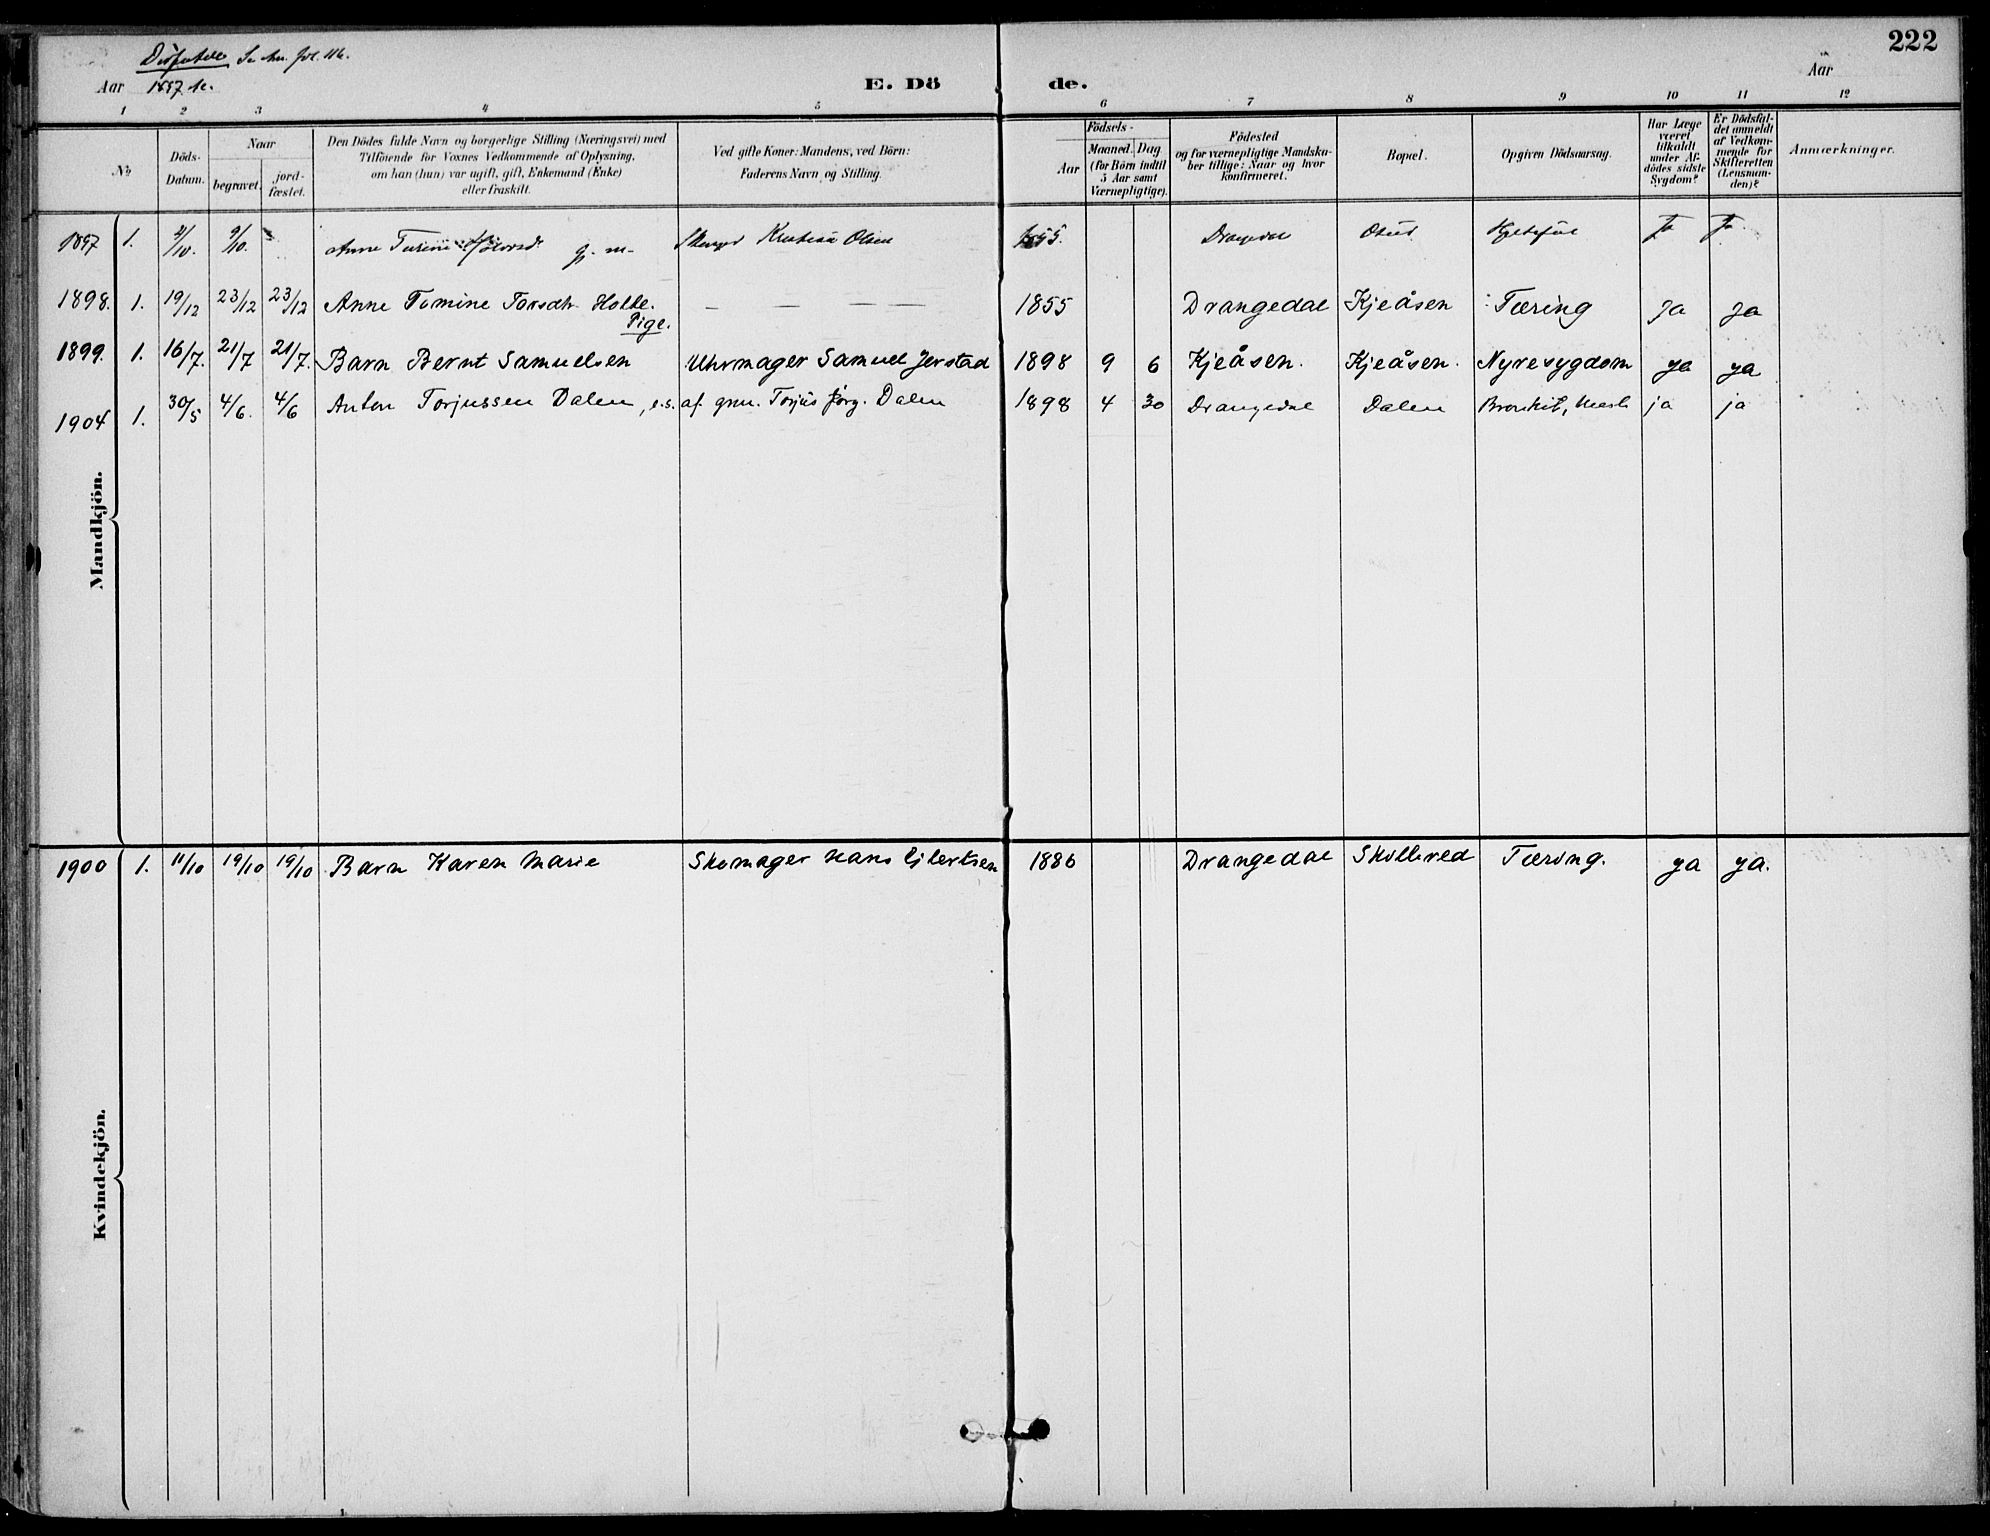 SAKO, Drangedal kirkebøker, F/Fa/L0012: Ministerialbok nr. 12, 1895-1905, s. 222